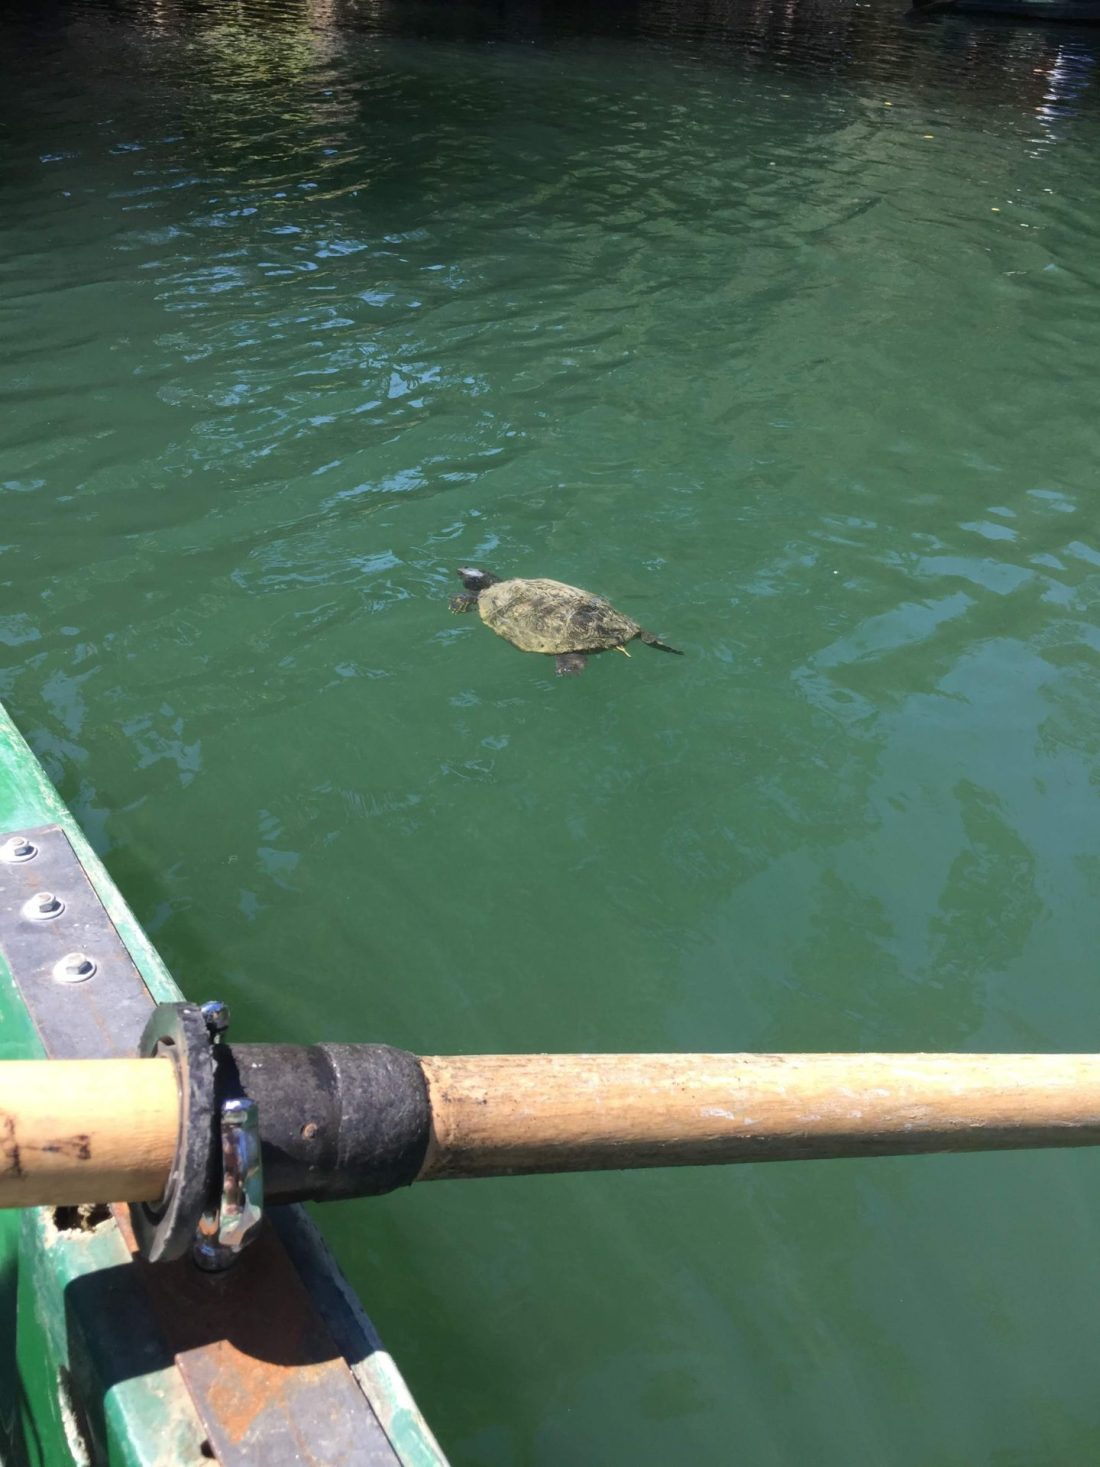 Tortoise in Villa Borghese Gardens lake